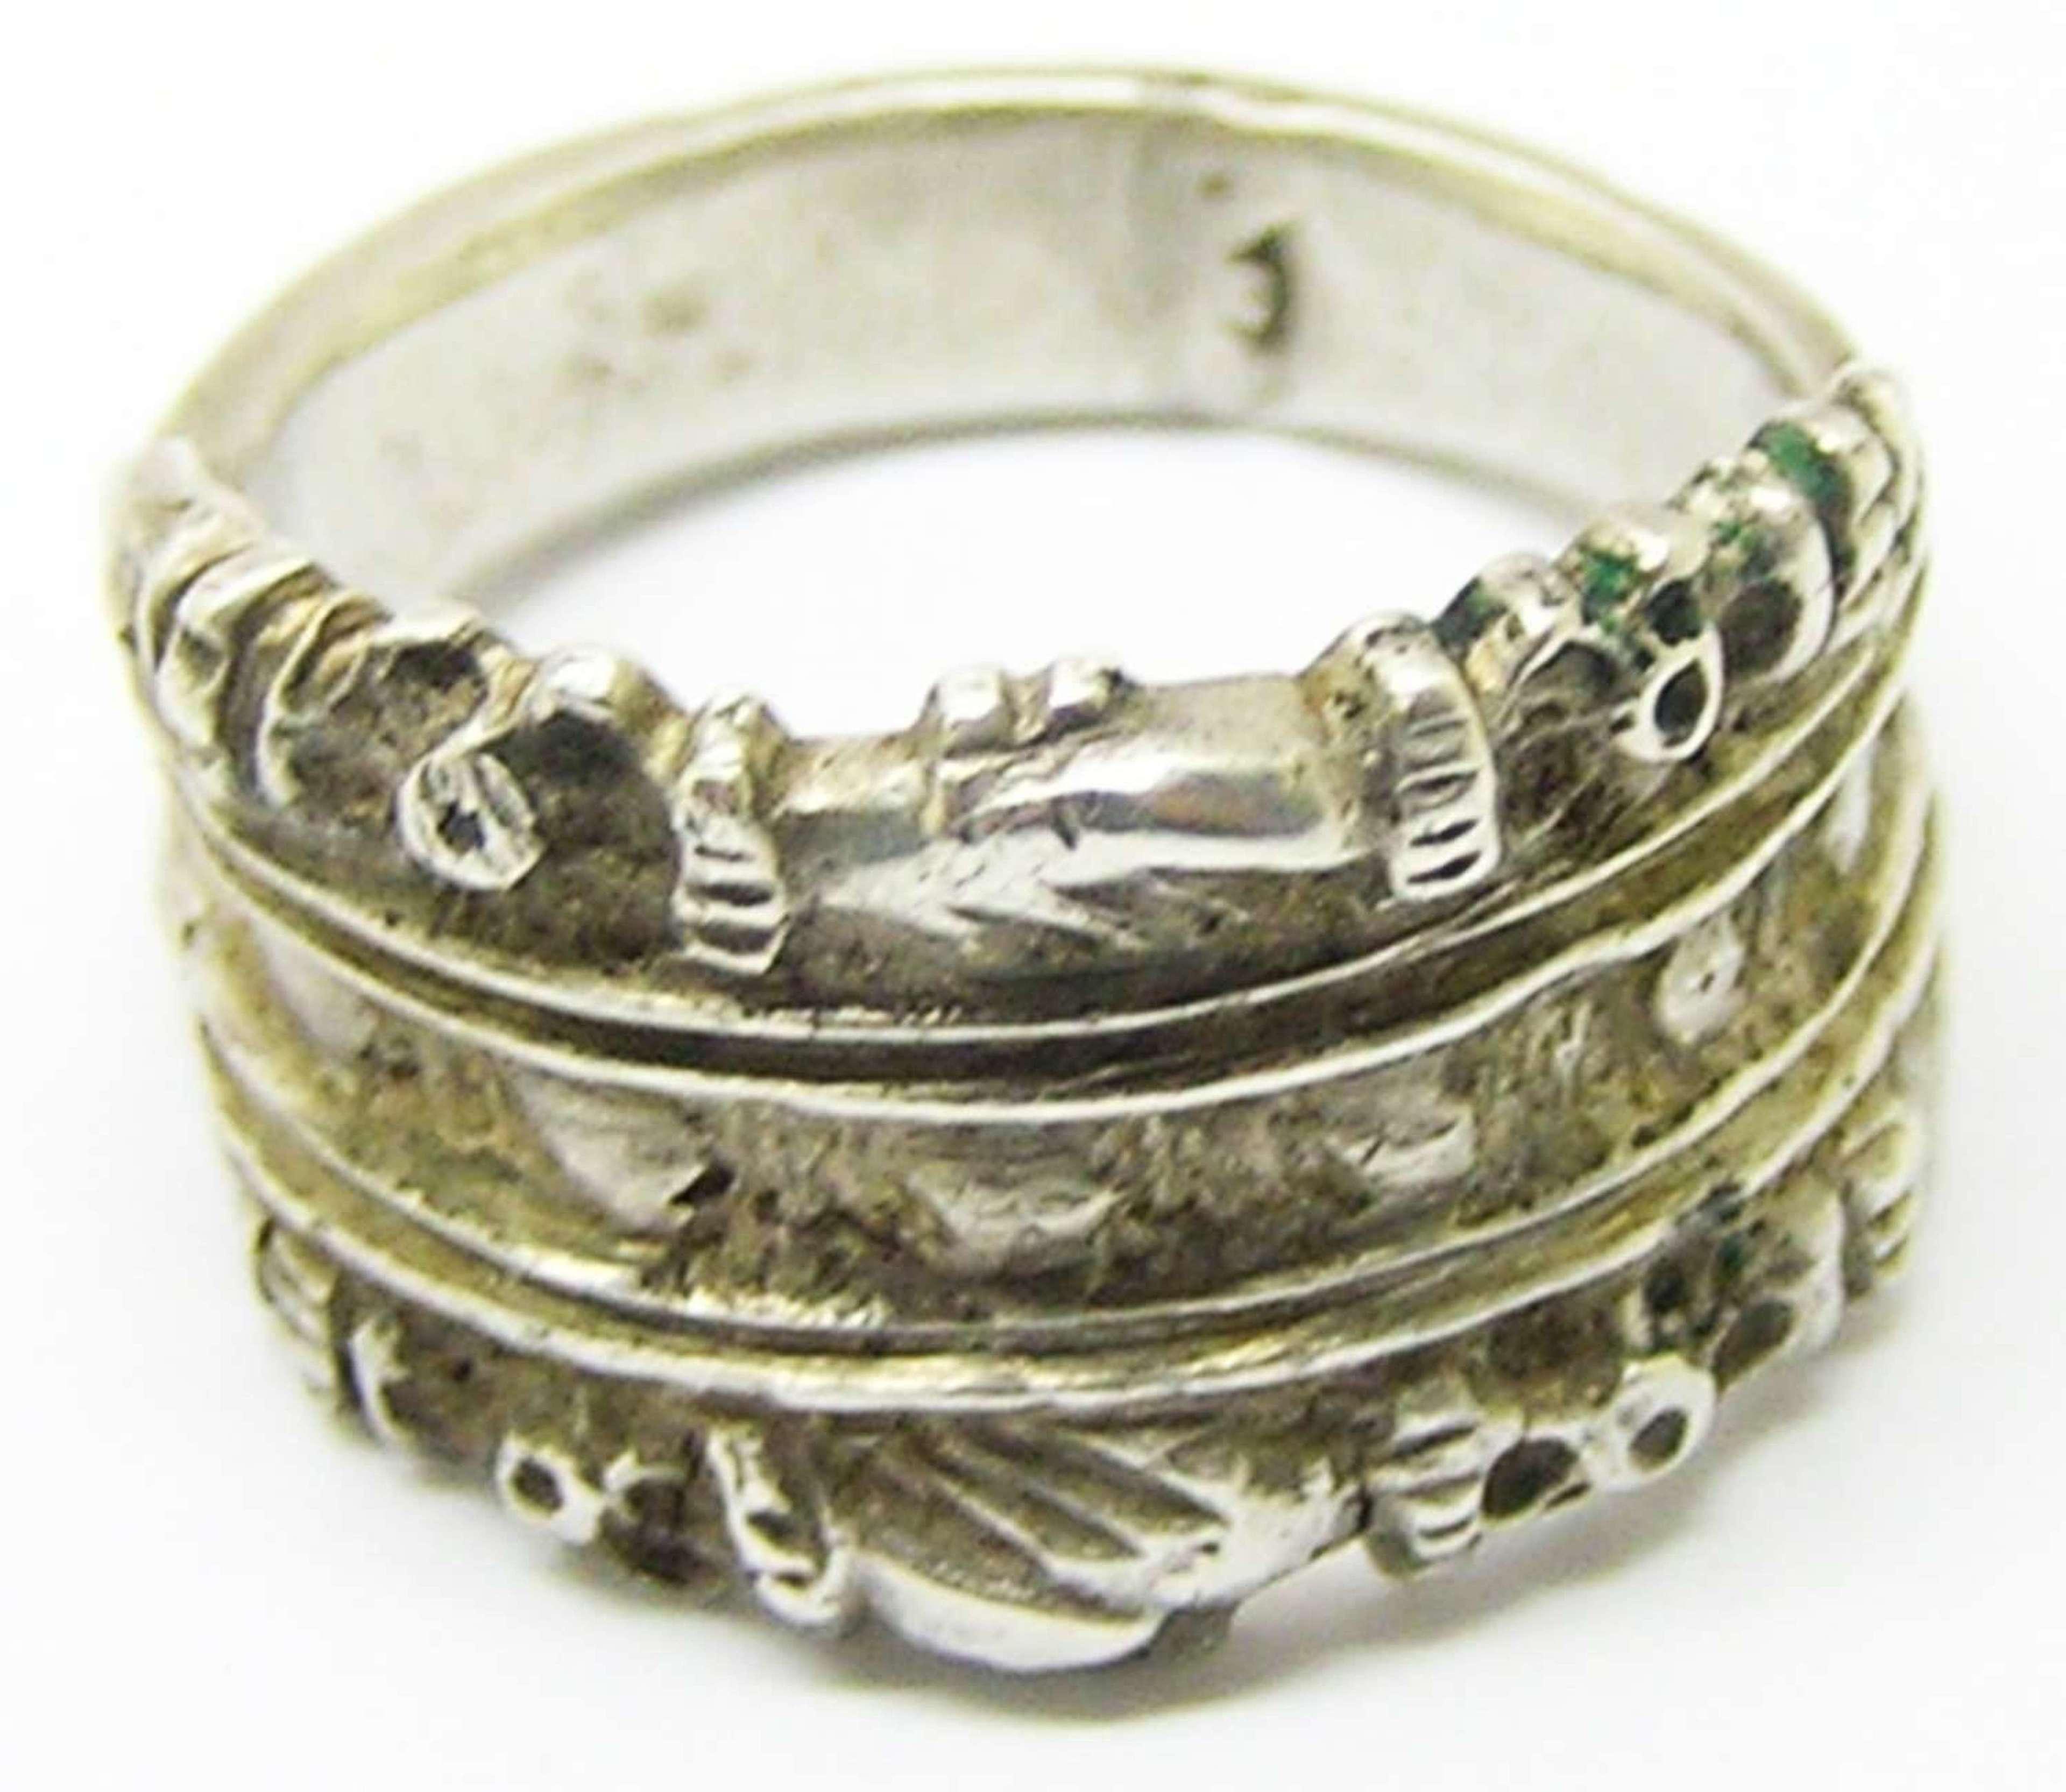 Renaissance silver betrothal/wedding ring